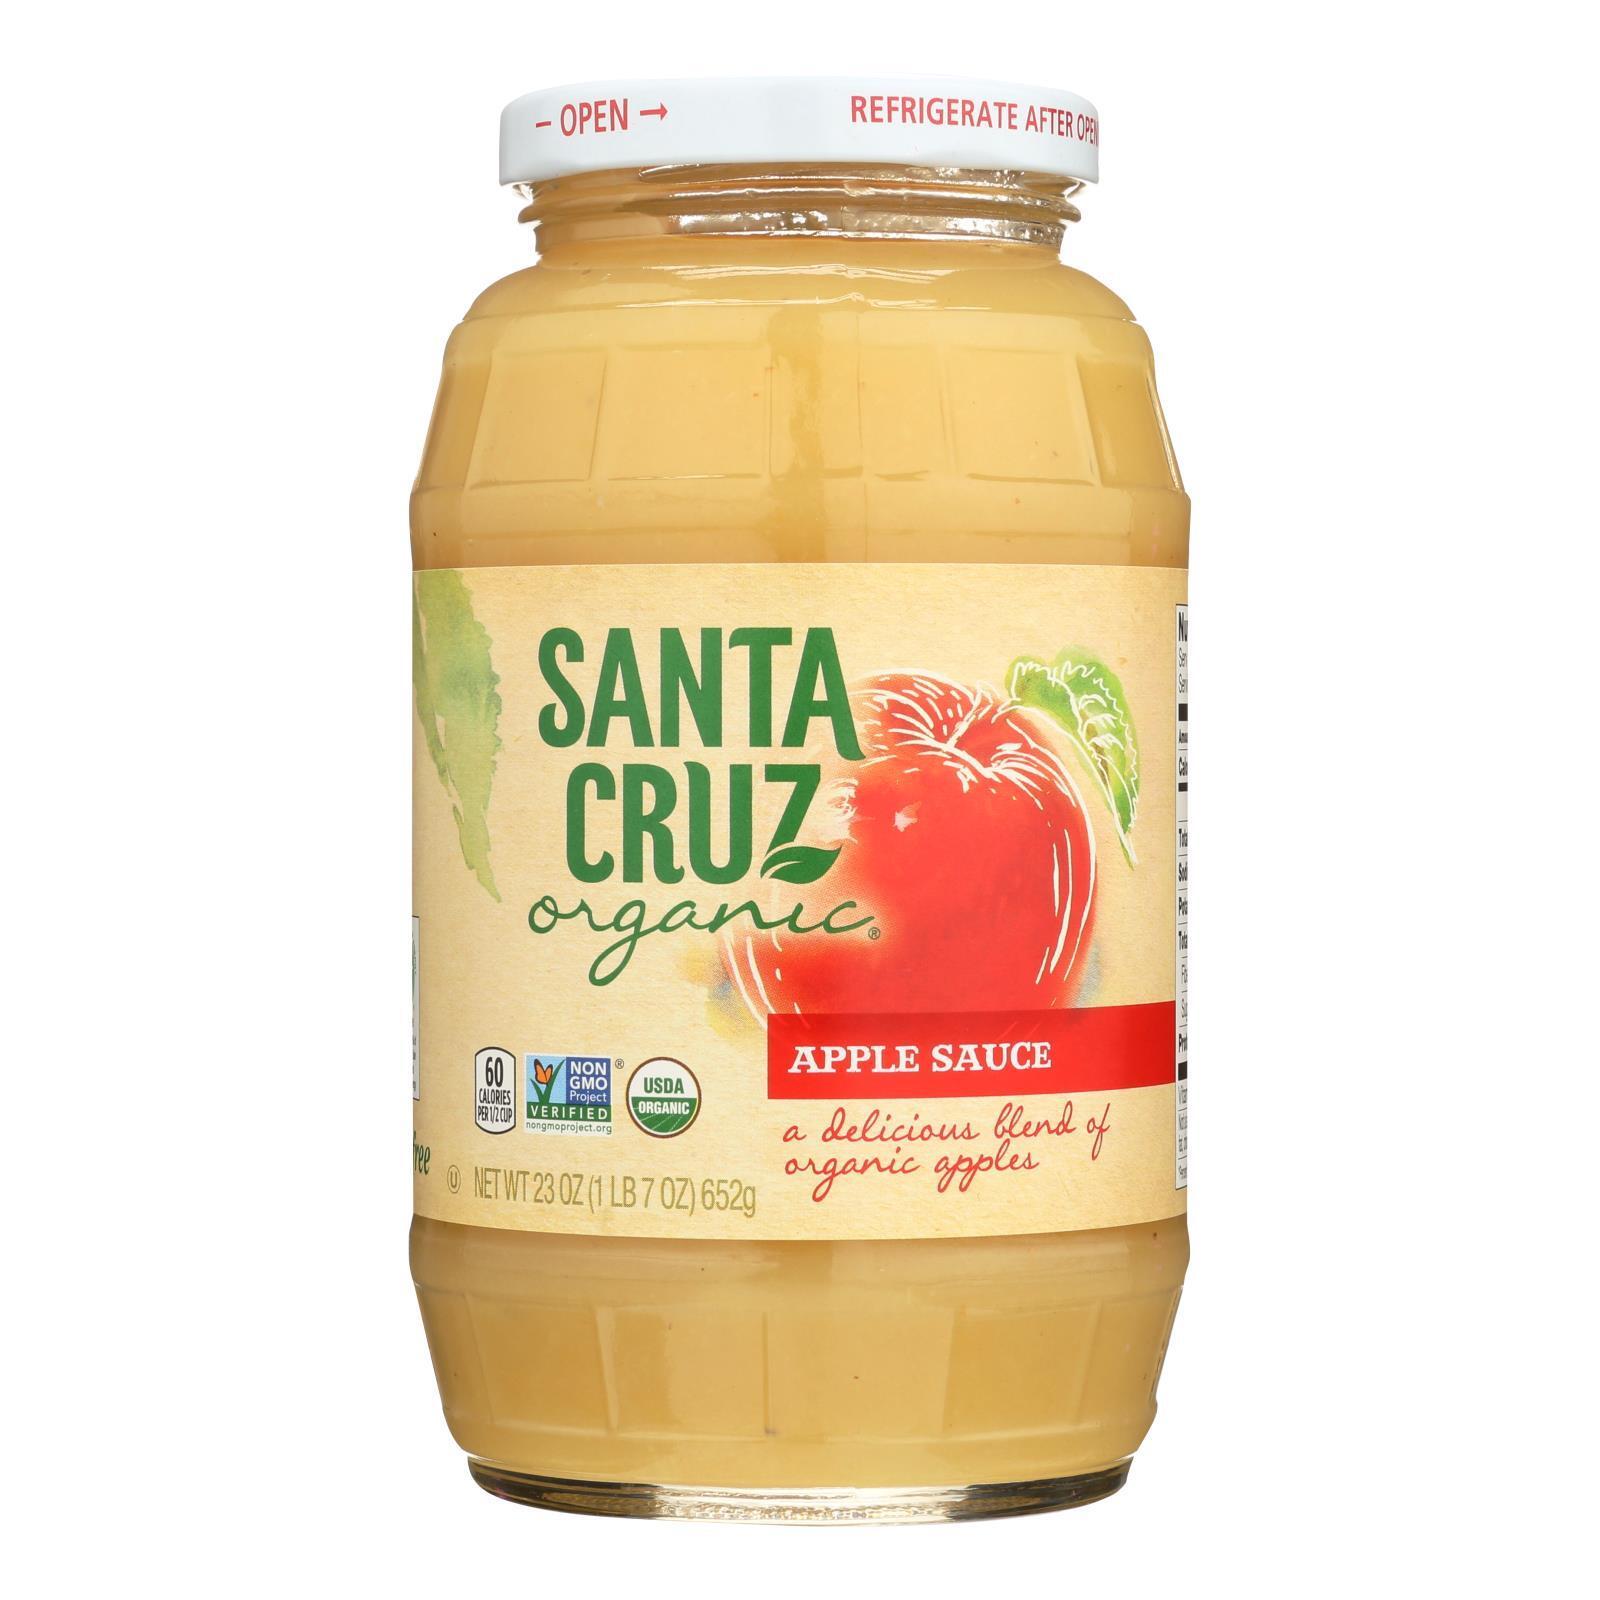 Santa Cruz Organic Apple Sauce - Case of 12 - 23 oz.